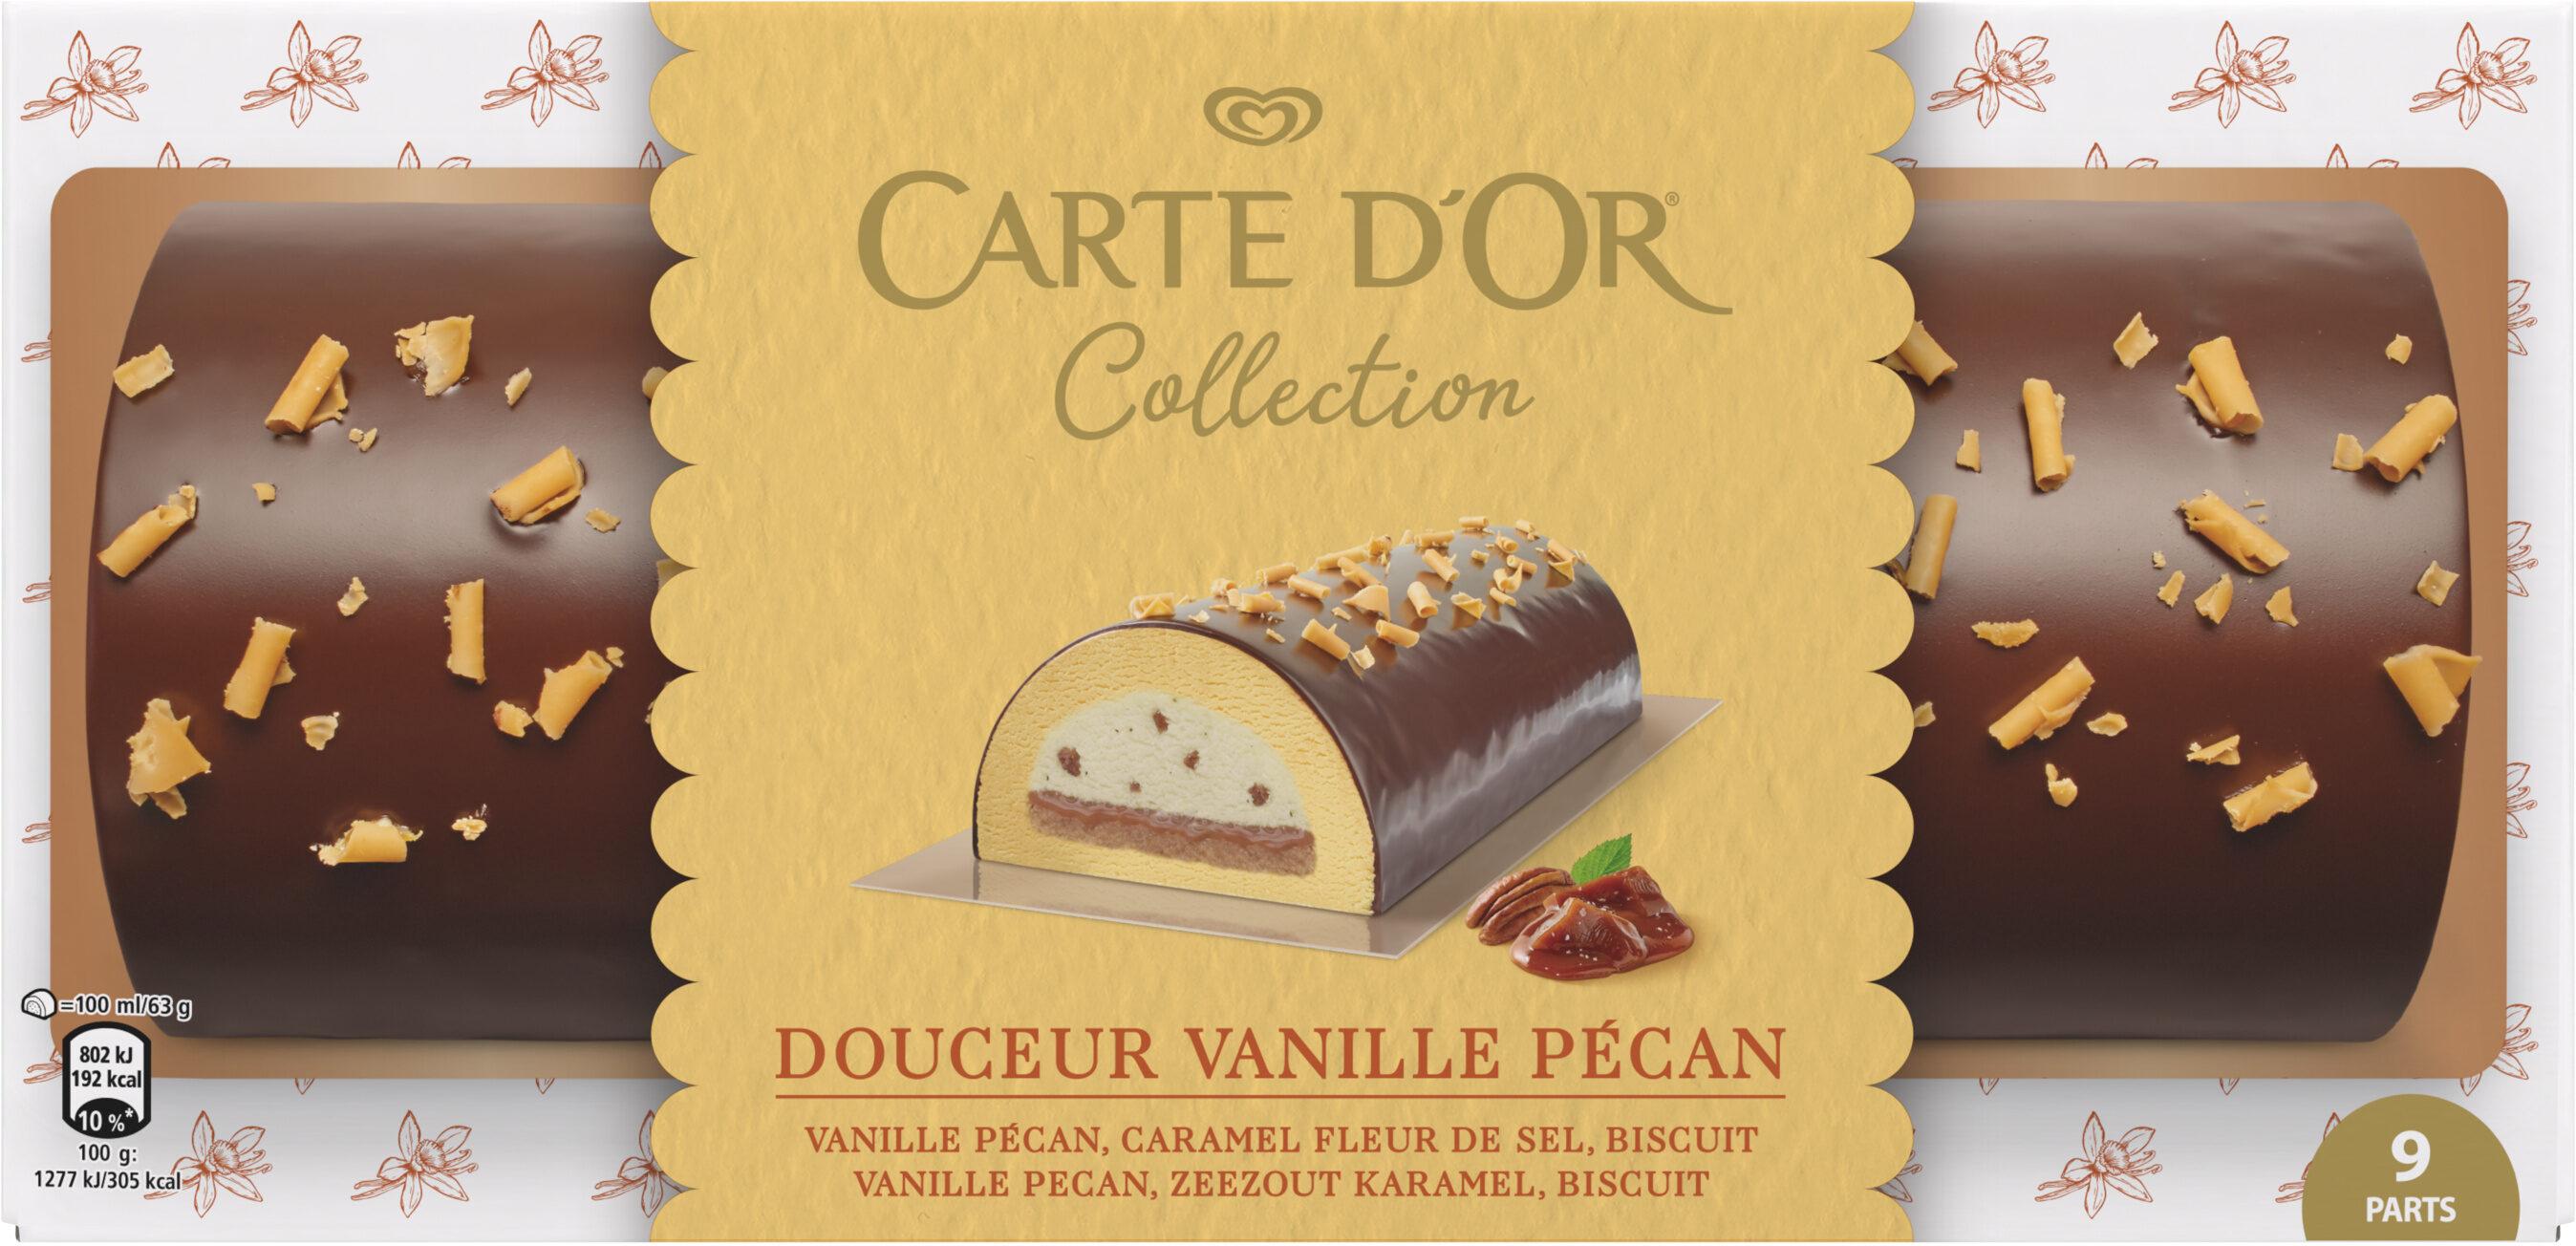 Carte D'or Collection Buche Glacée Douceur Vanille Pecan 9 parts 900ml - Product - fr